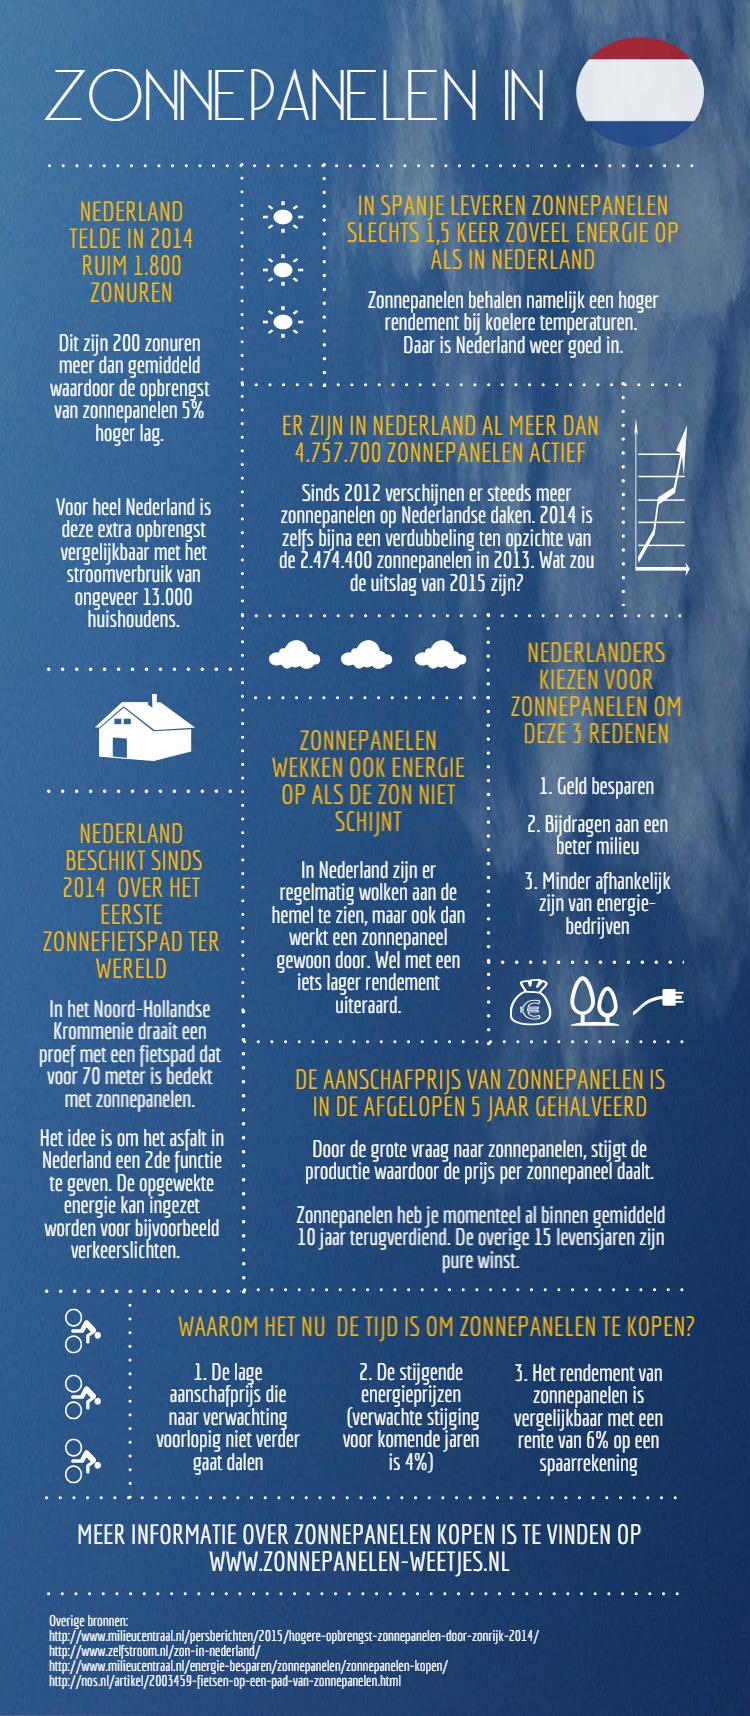 Leuke infographic over zonnepanelen Bron: zonnepanelenweetjes.nl